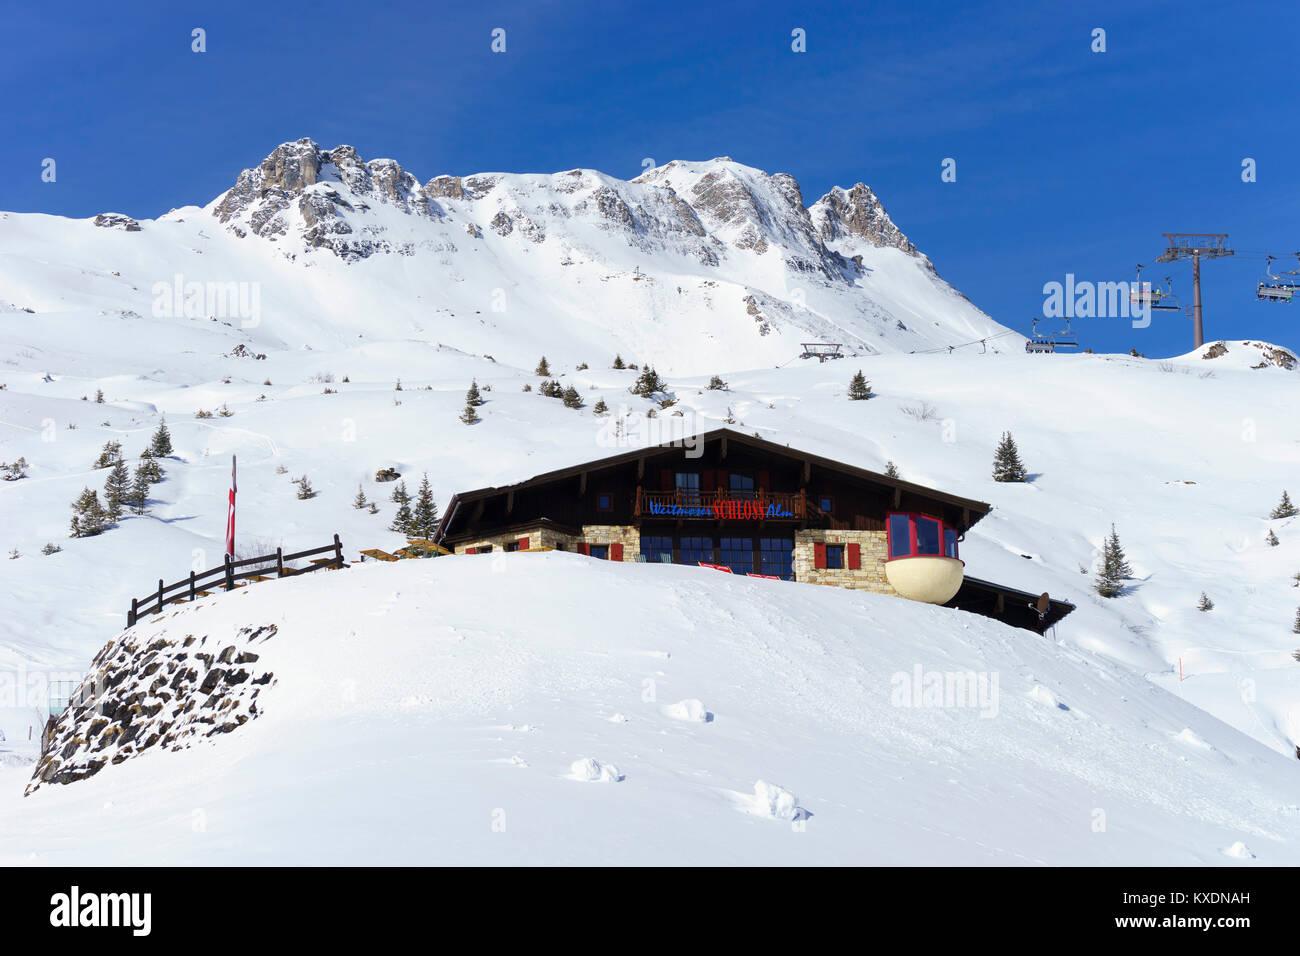 ski hut stock photos ski hut stock images alamy. Black Bedroom Furniture Sets. Home Design Ideas